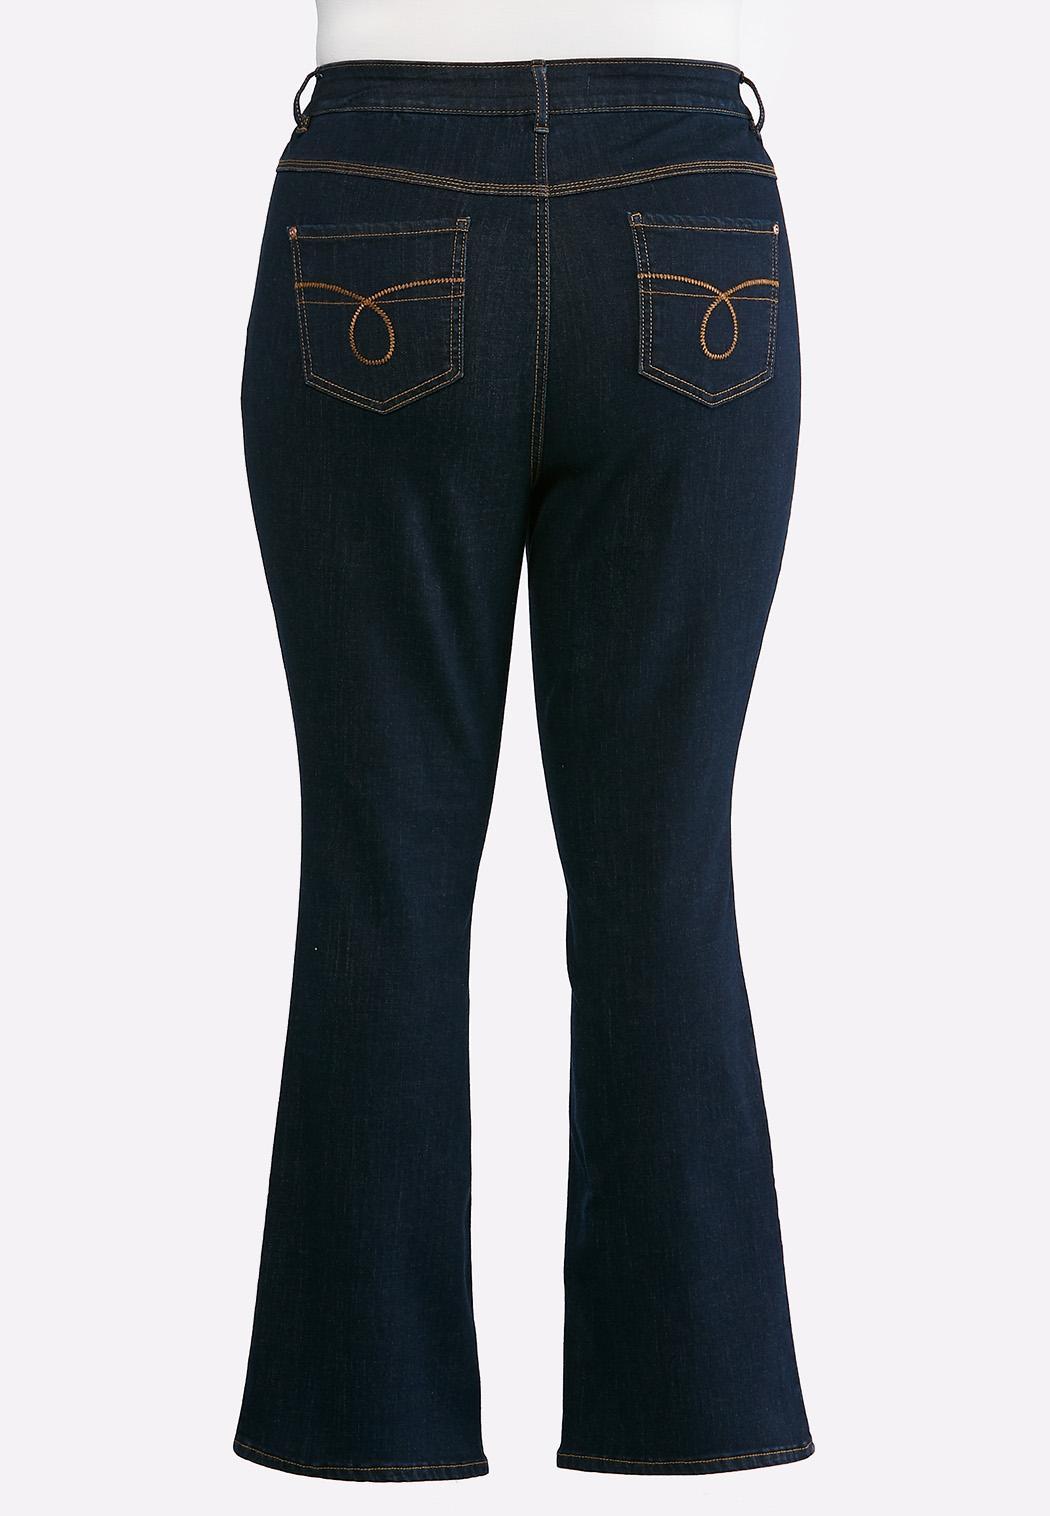 Plus Size Dark Bootcut Jeans (Item #43639599)